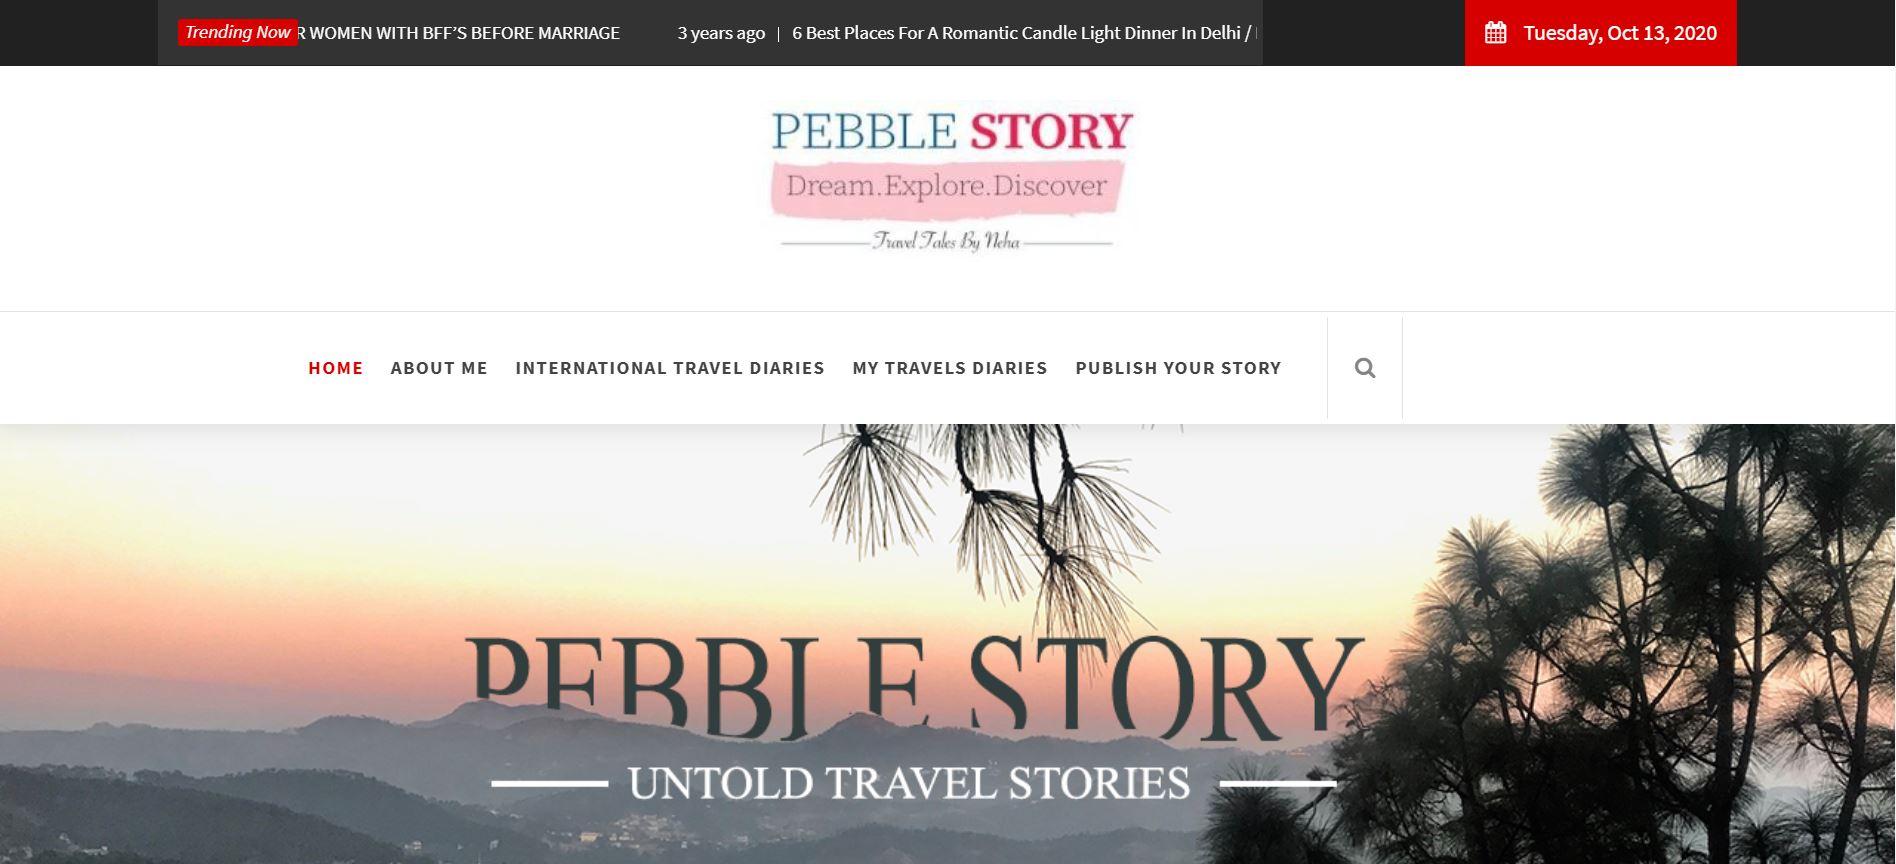 PebbleStory